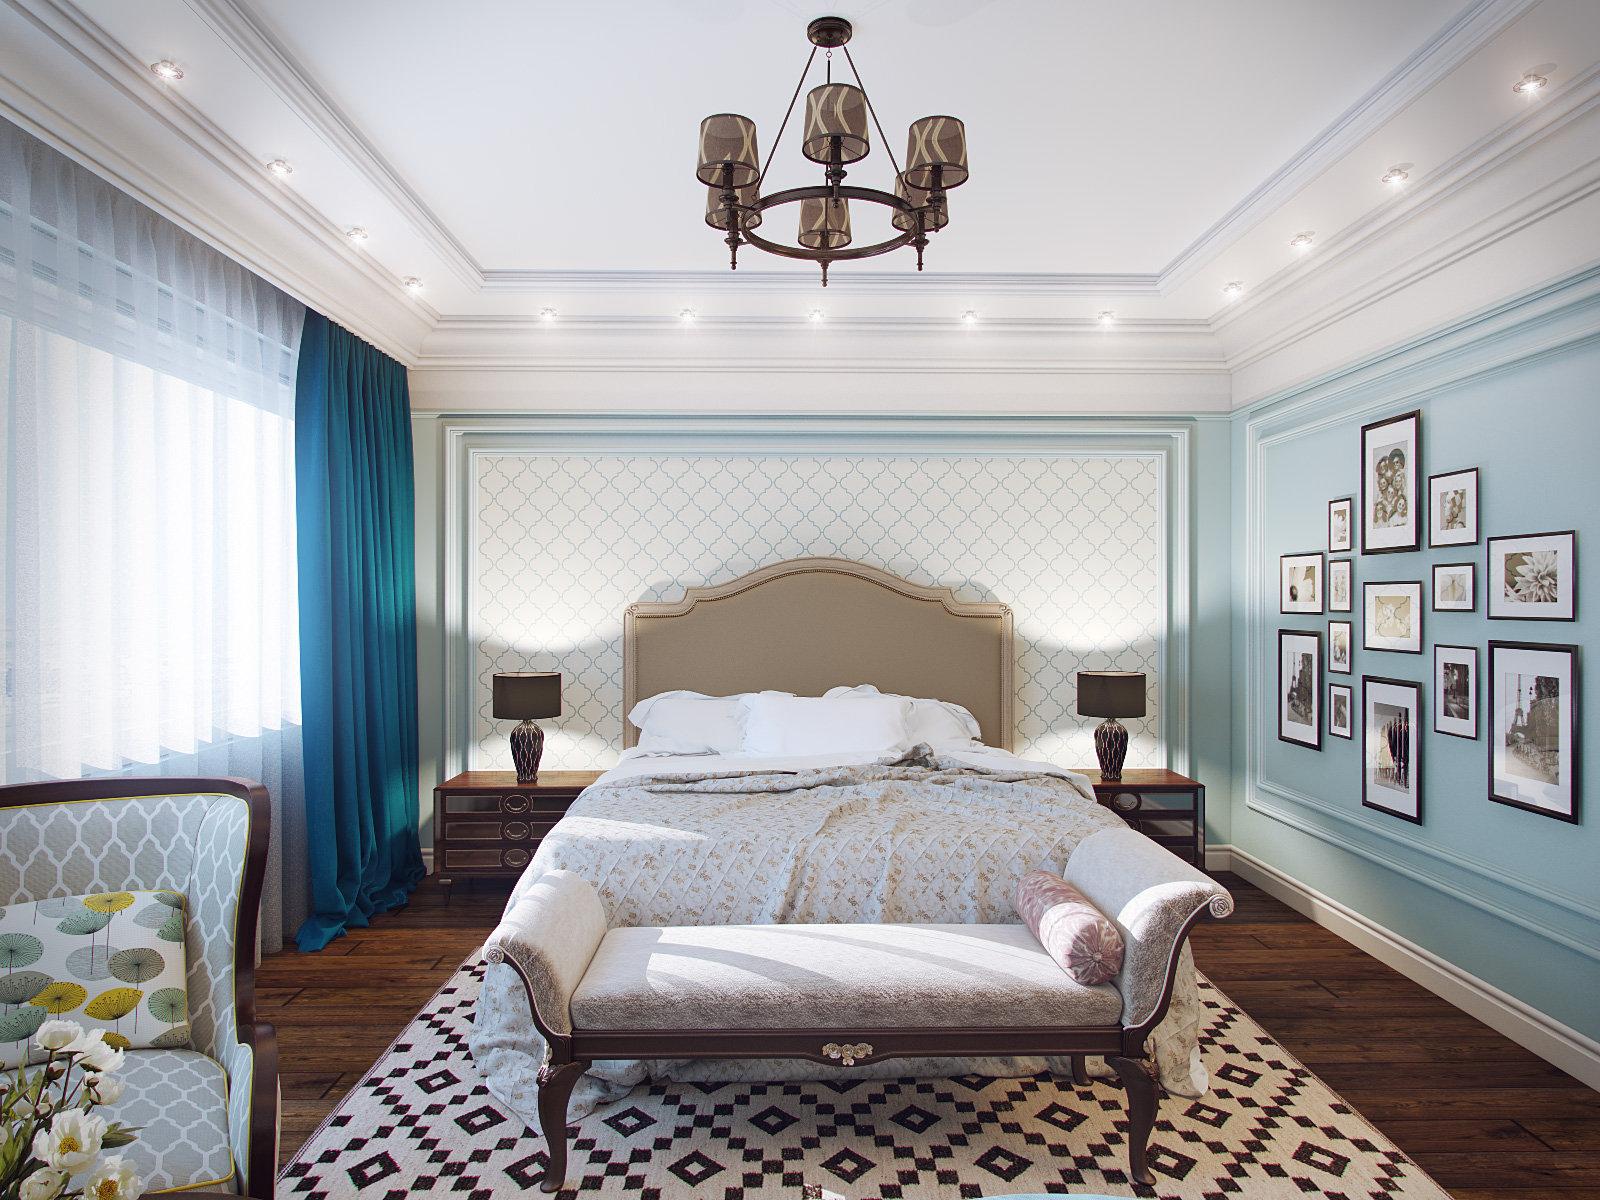 2014 - Hotel room